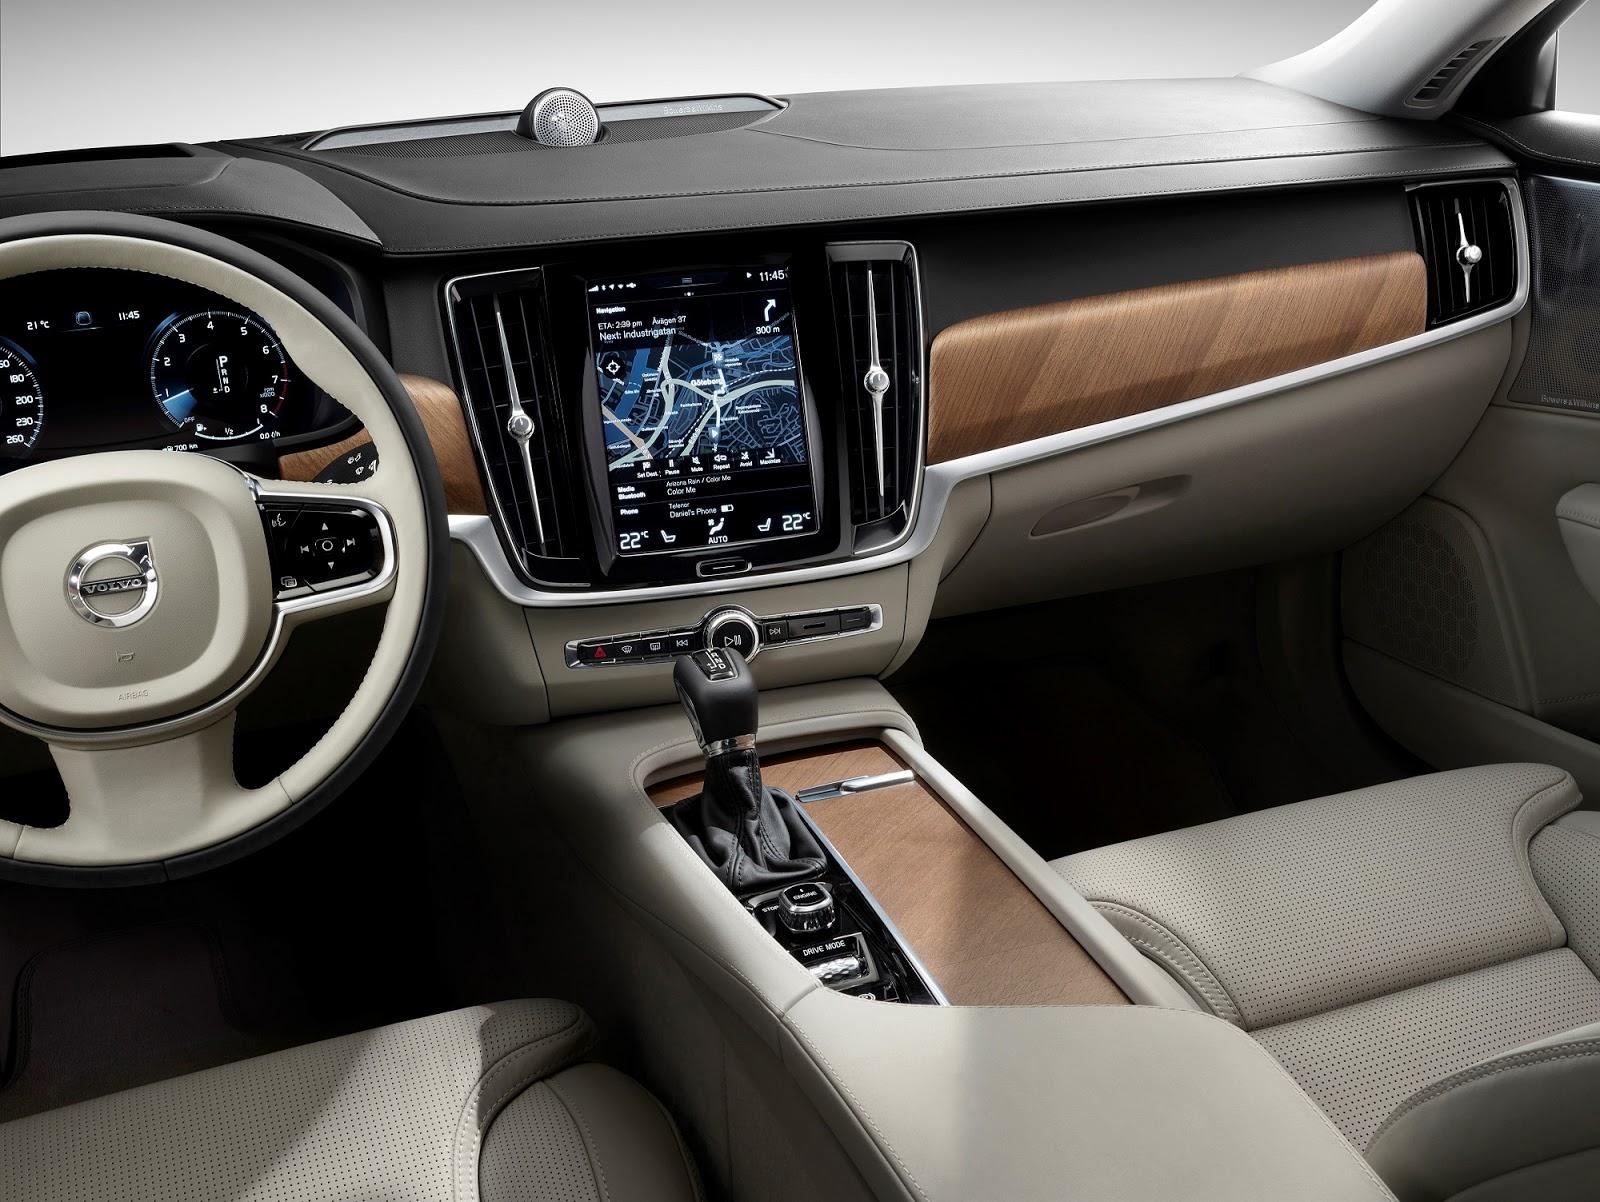 NEW%2BVOLVO%2BS90 170073 Interior cockpit Το νέο Volvo S90 έρχεται και βάζει φωτιά στον ανταγωνισμό premium sedan, Volvo, Volvo Cars, Volvo S90